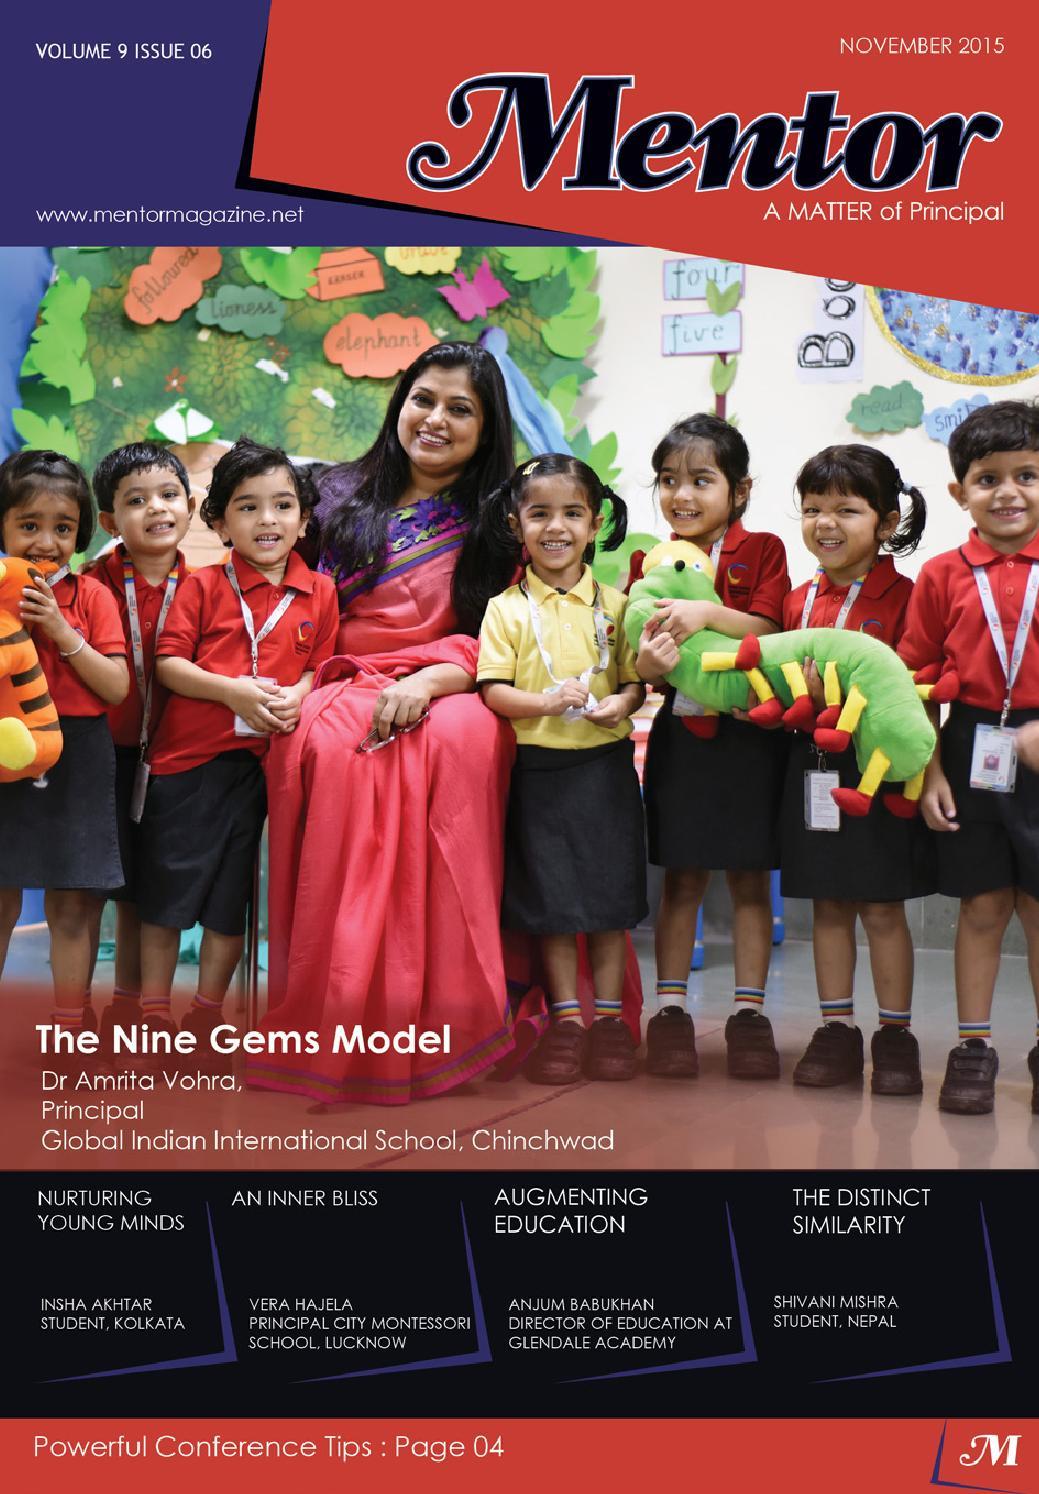 Mentor November 2015 Vol 09 Issue 06 By Magazine